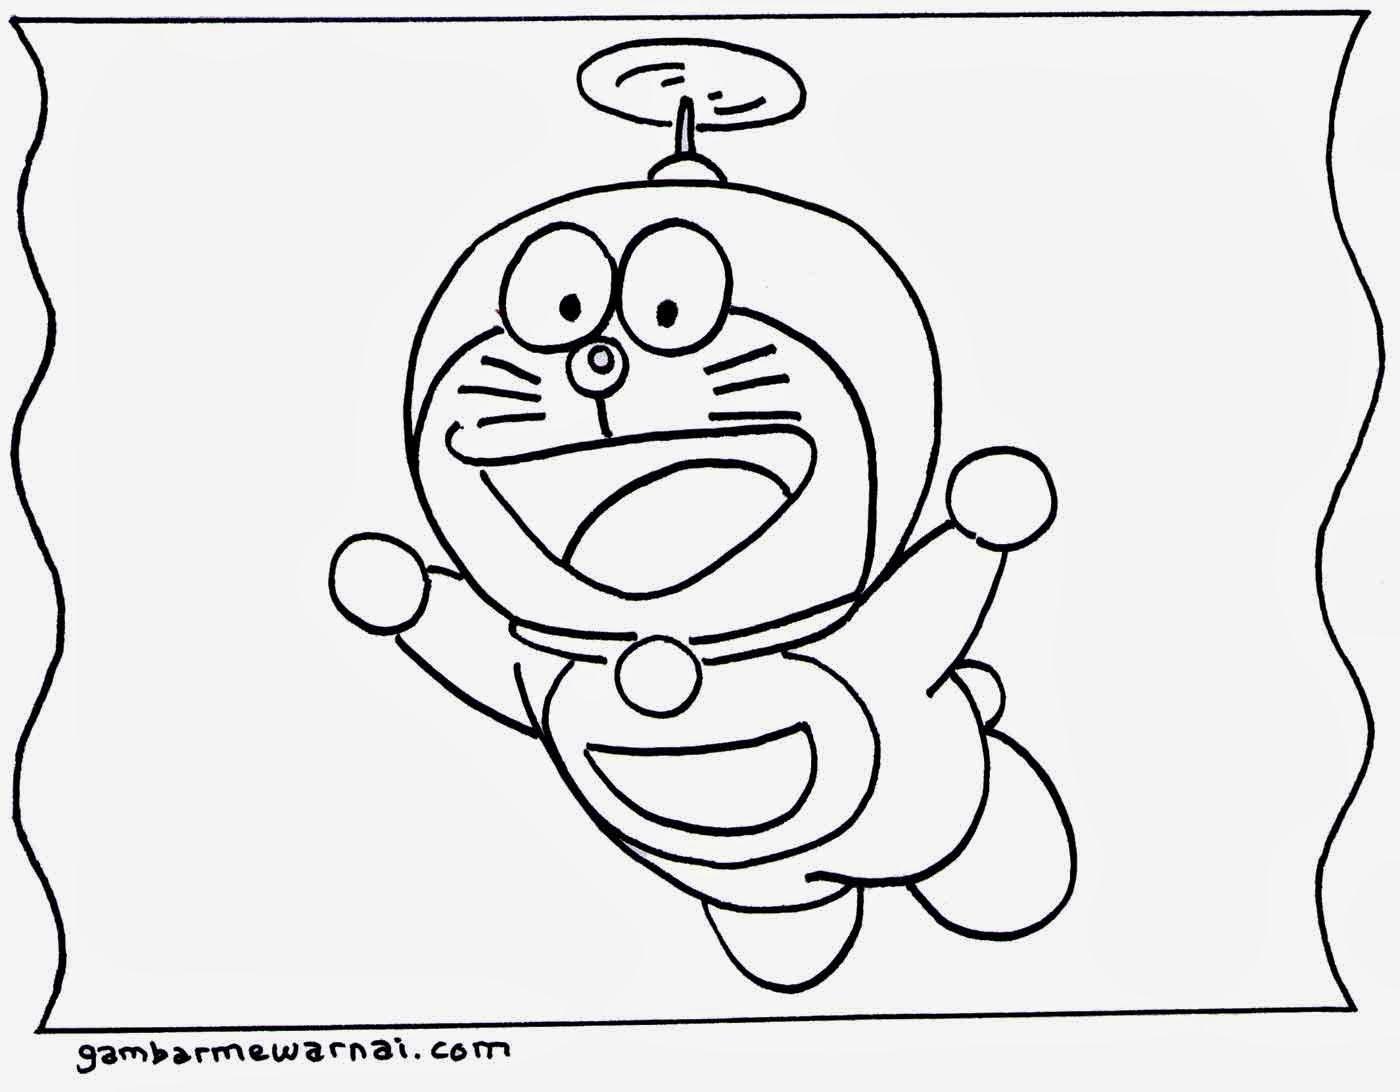 Kumpulan Gambar Mewarnai Kartun Upin Ipin Seribu Animasi